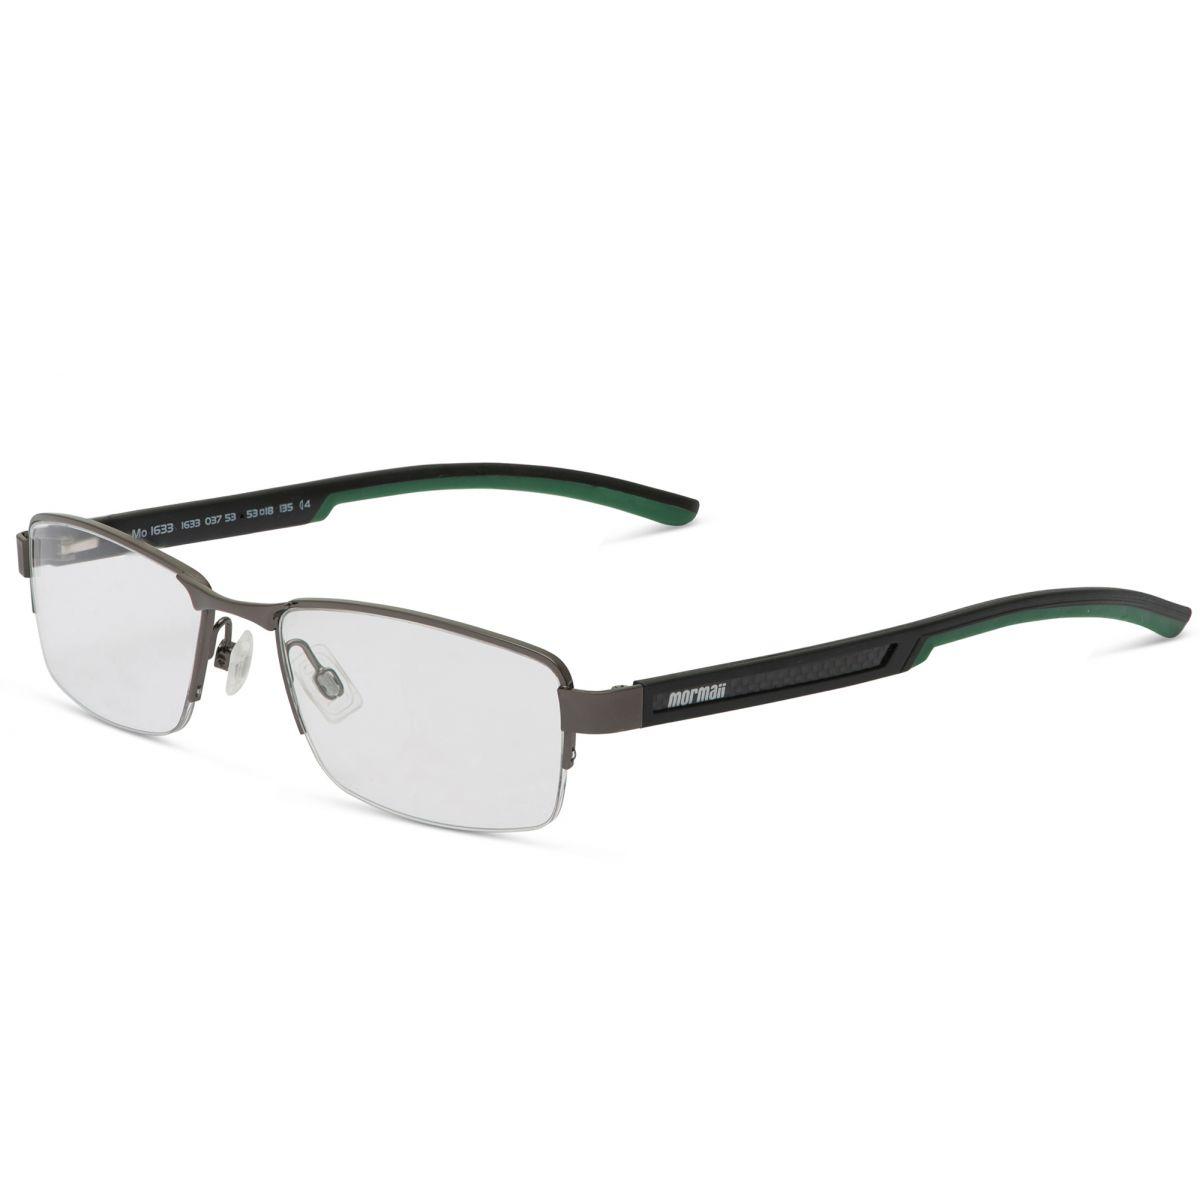 Oculos Mormaii Masculino Mercadolivre   City of Kenmore, Washington ca6e726888